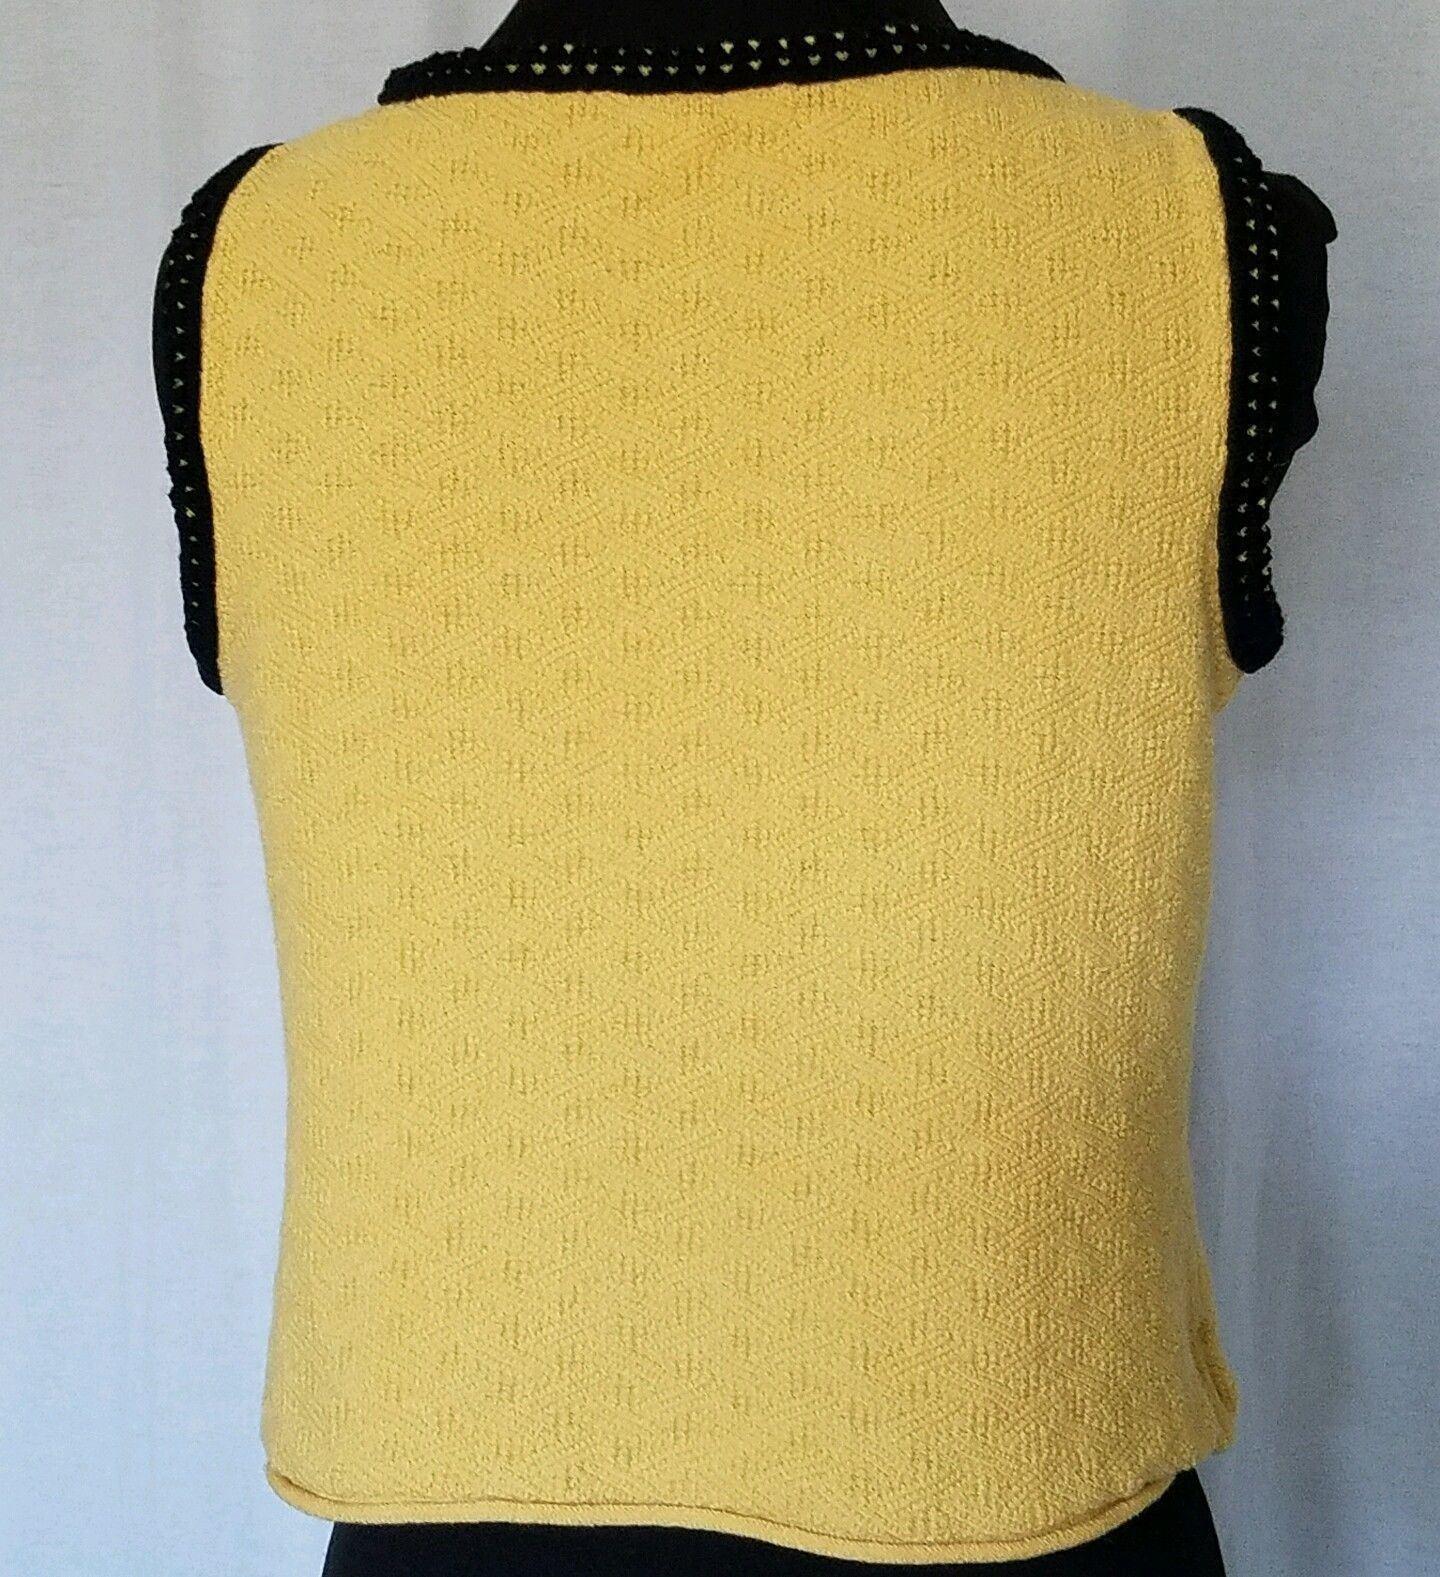 St John Knit Yellow Top Black Trim Round Neckline Sleeveless Size Small